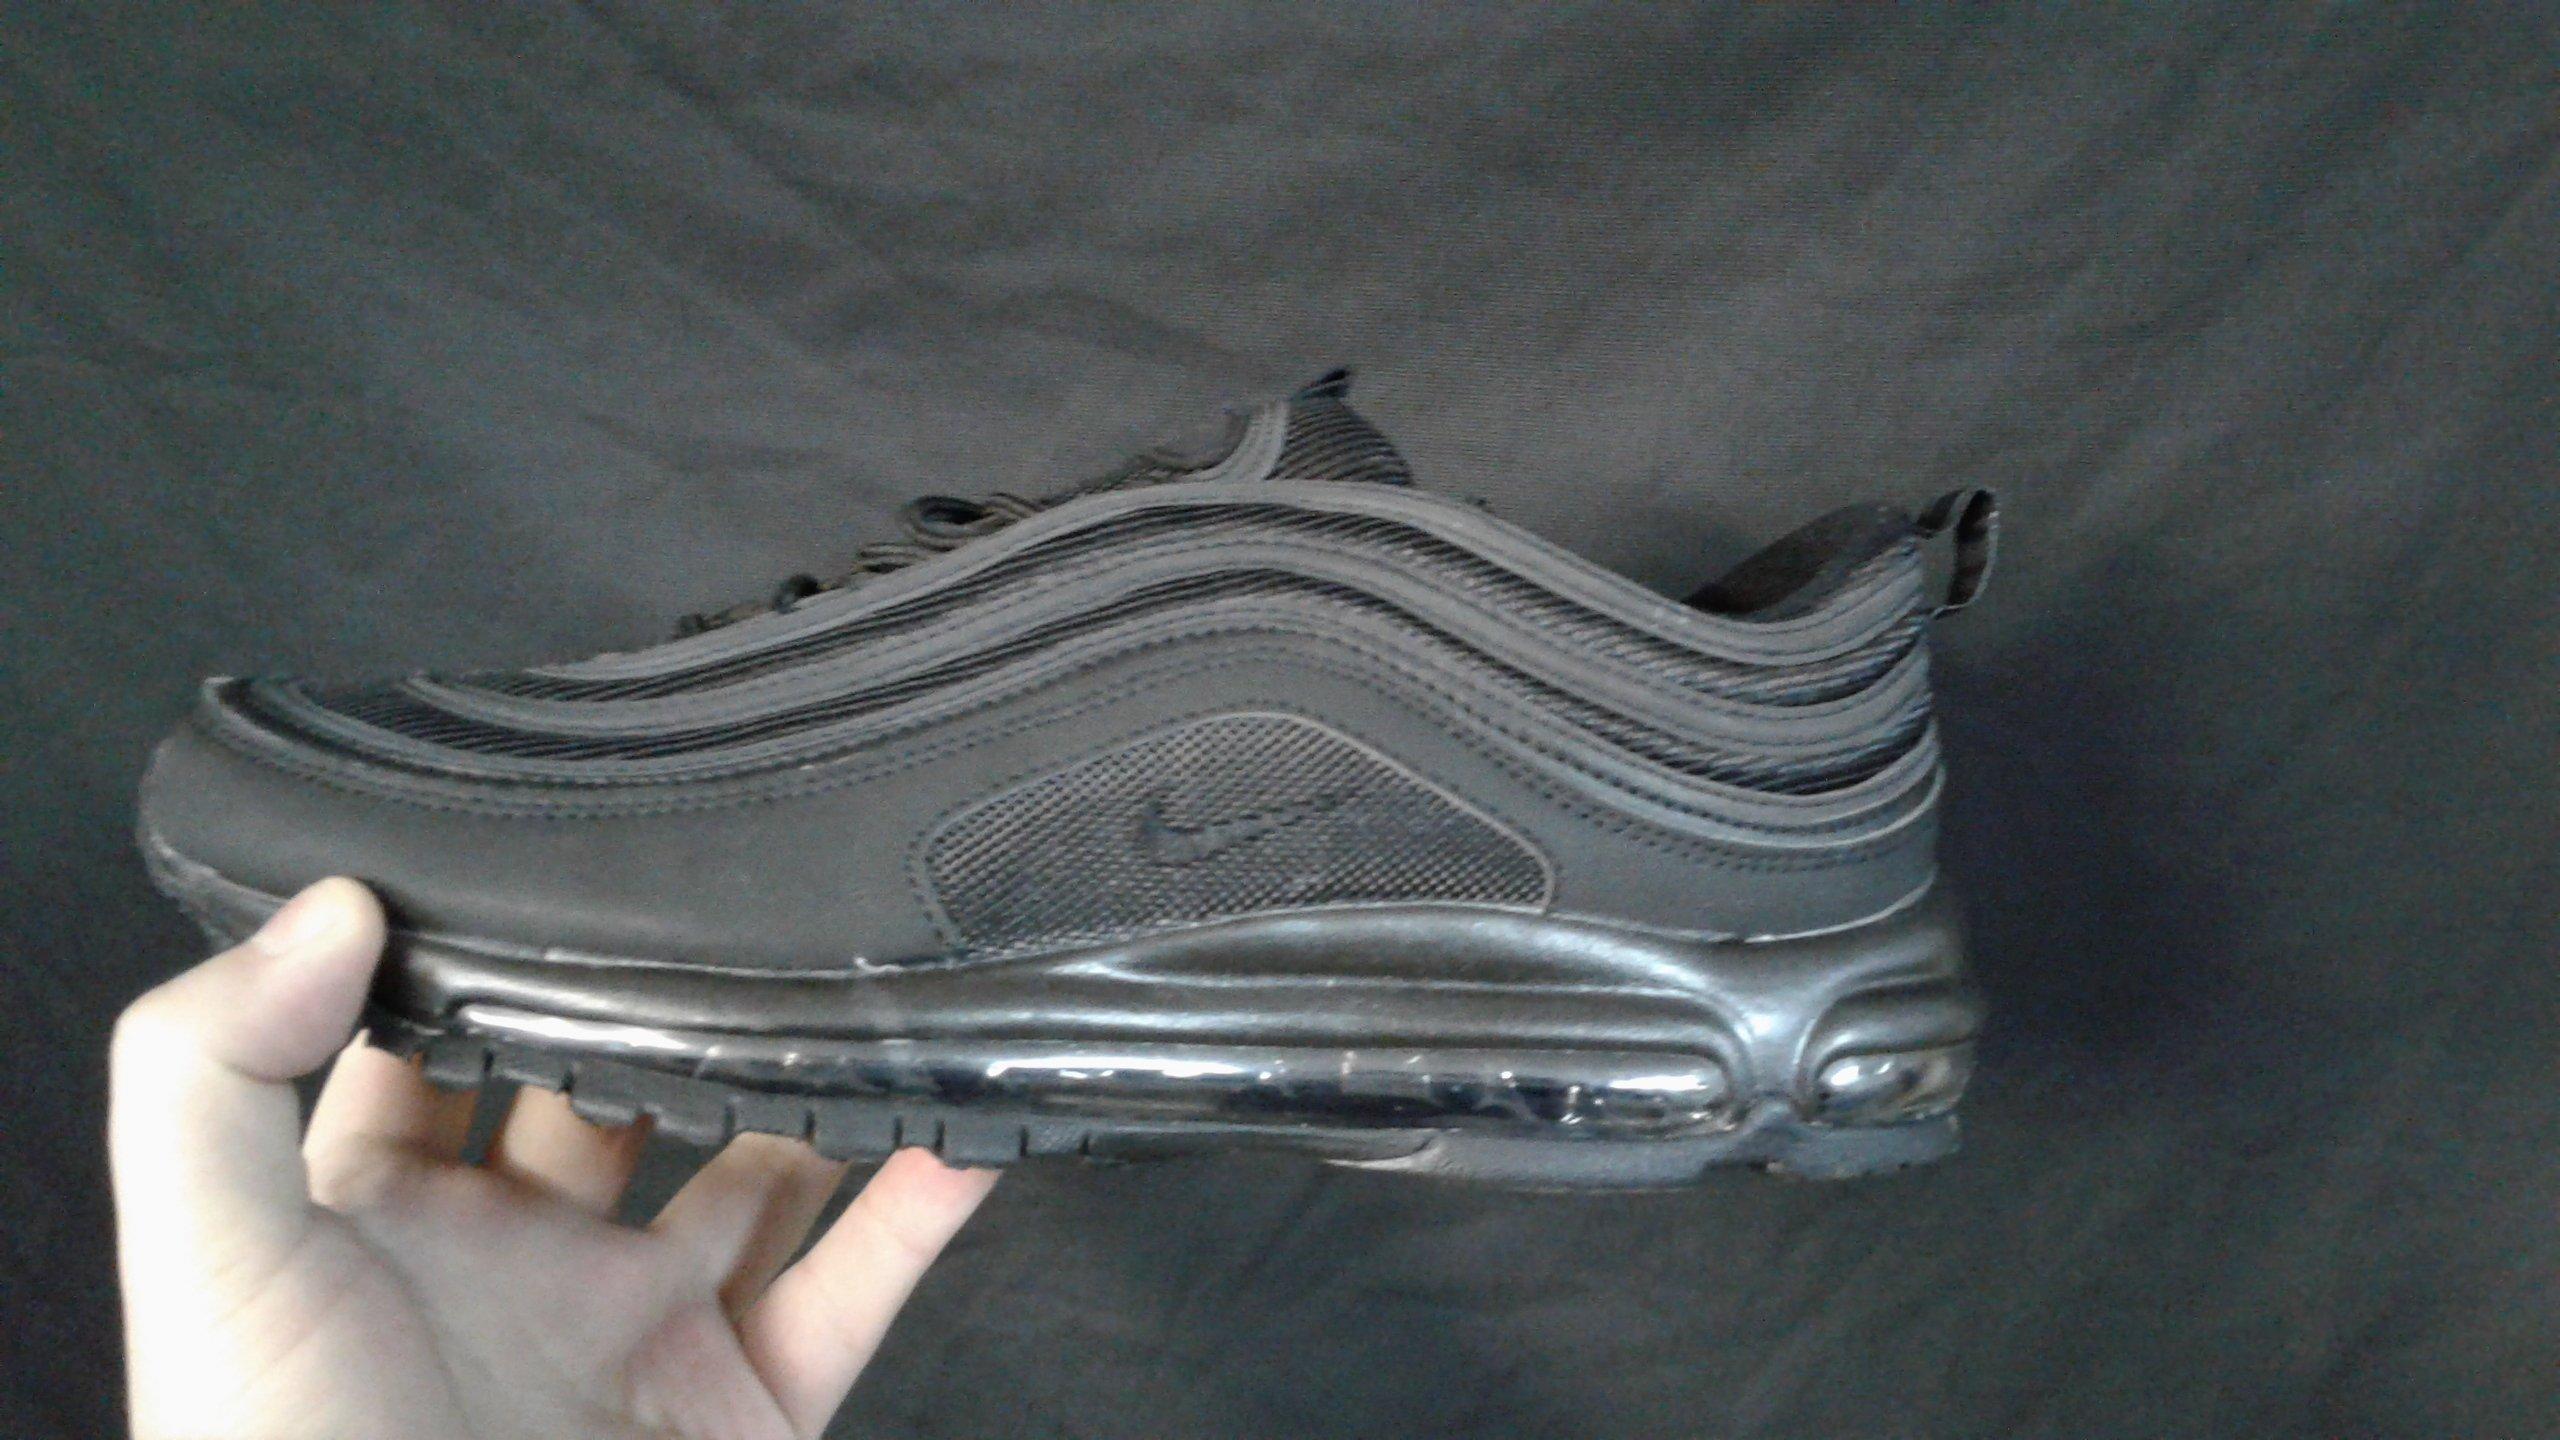 Nike air max 97 Black r41 7312881235 oficjalne archiwum